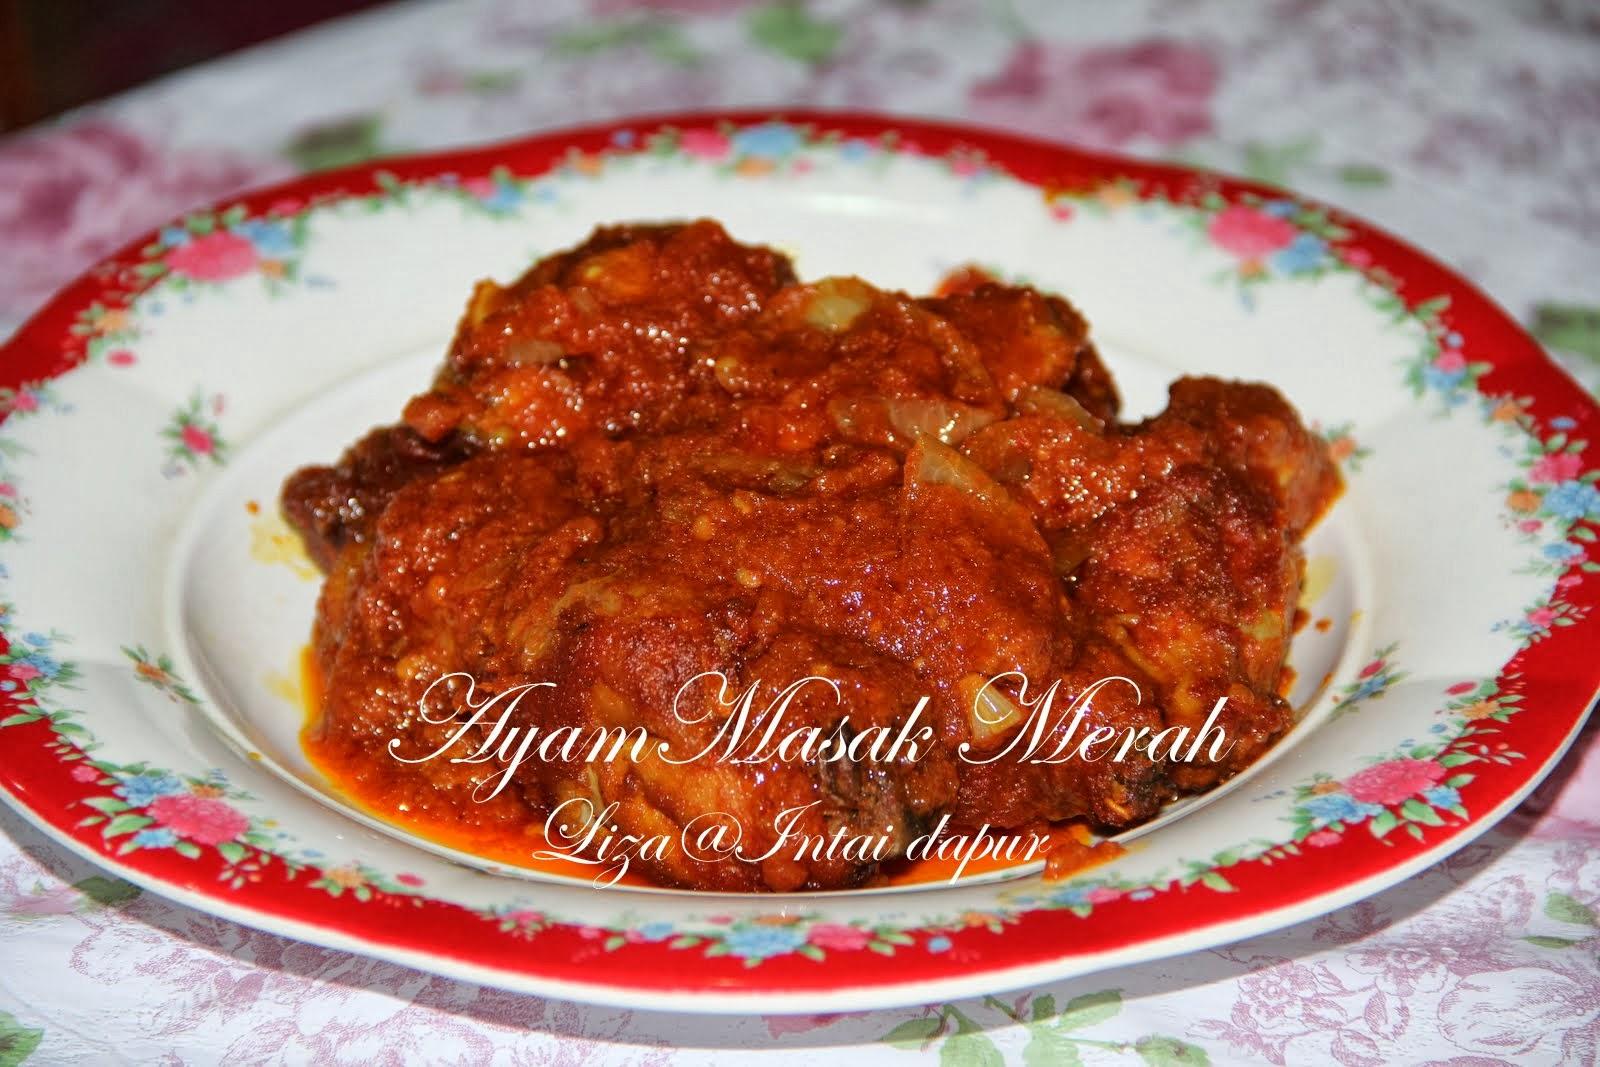 Intai Dapur Sup Sayur Campur N Ayam Masak Merah